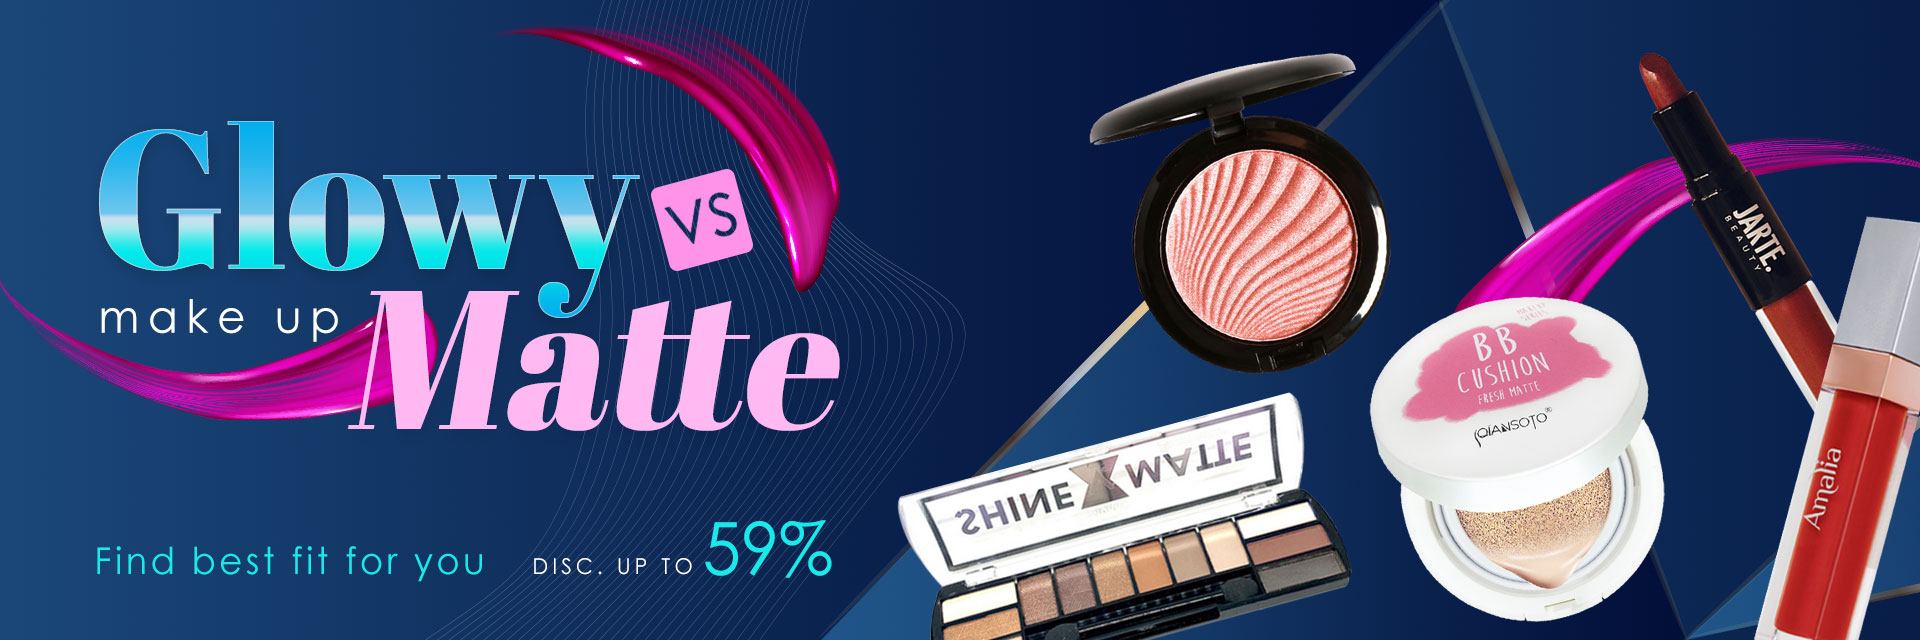 Gloosy Makeup vs Matte Make up